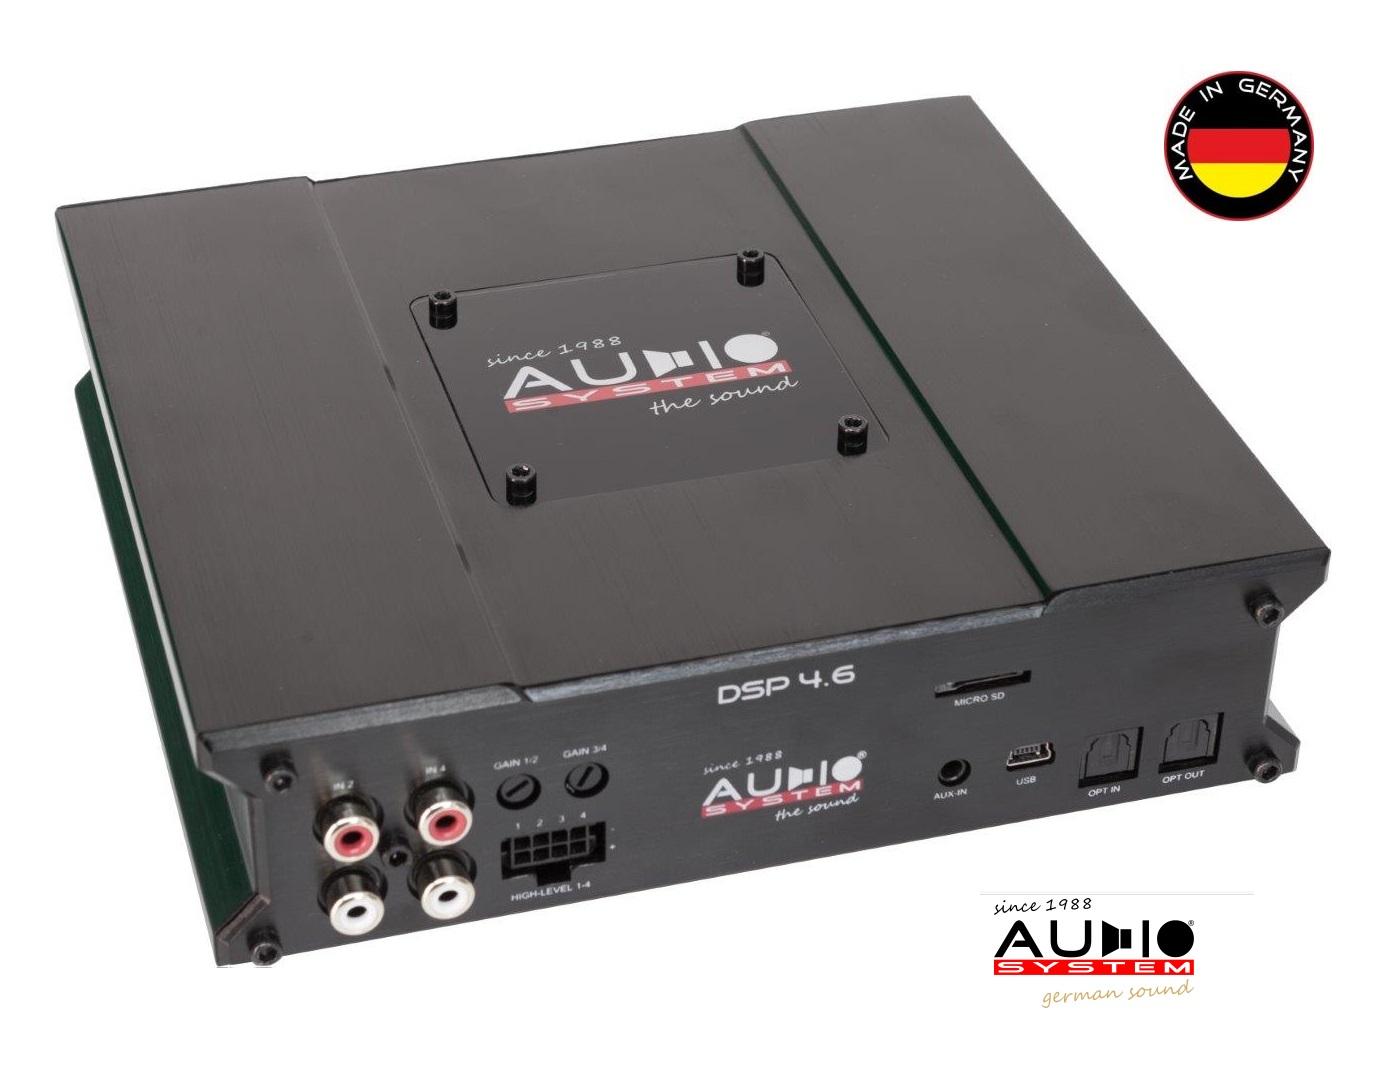 AUDIO SYSTEM DSP 4.6 6-Kanal Hochleistungs-DSP mit Freescale Multi-Core Chip